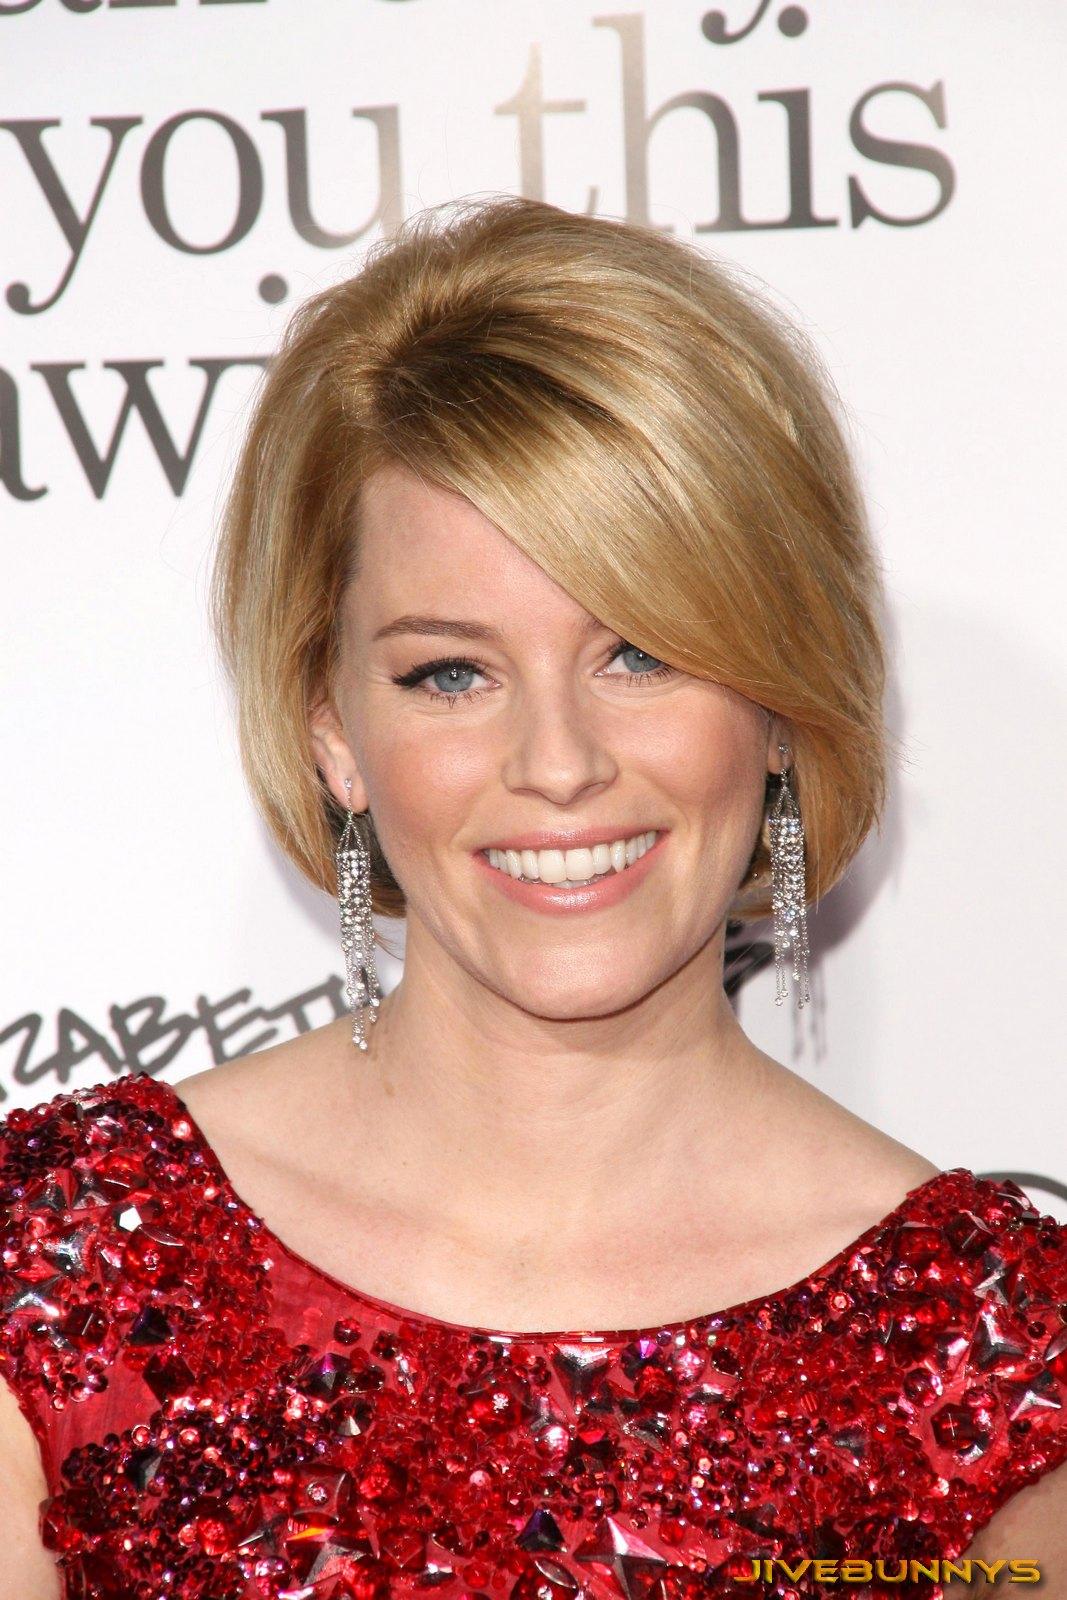 http://1.bp.blogspot.com/-m5_XleuIIMY/T3HXehhgBBI/AAAAAAAADU0/wwmj-yMNxDo/s1600/elizabeth-banks-actress-celebrity-10431.jpg